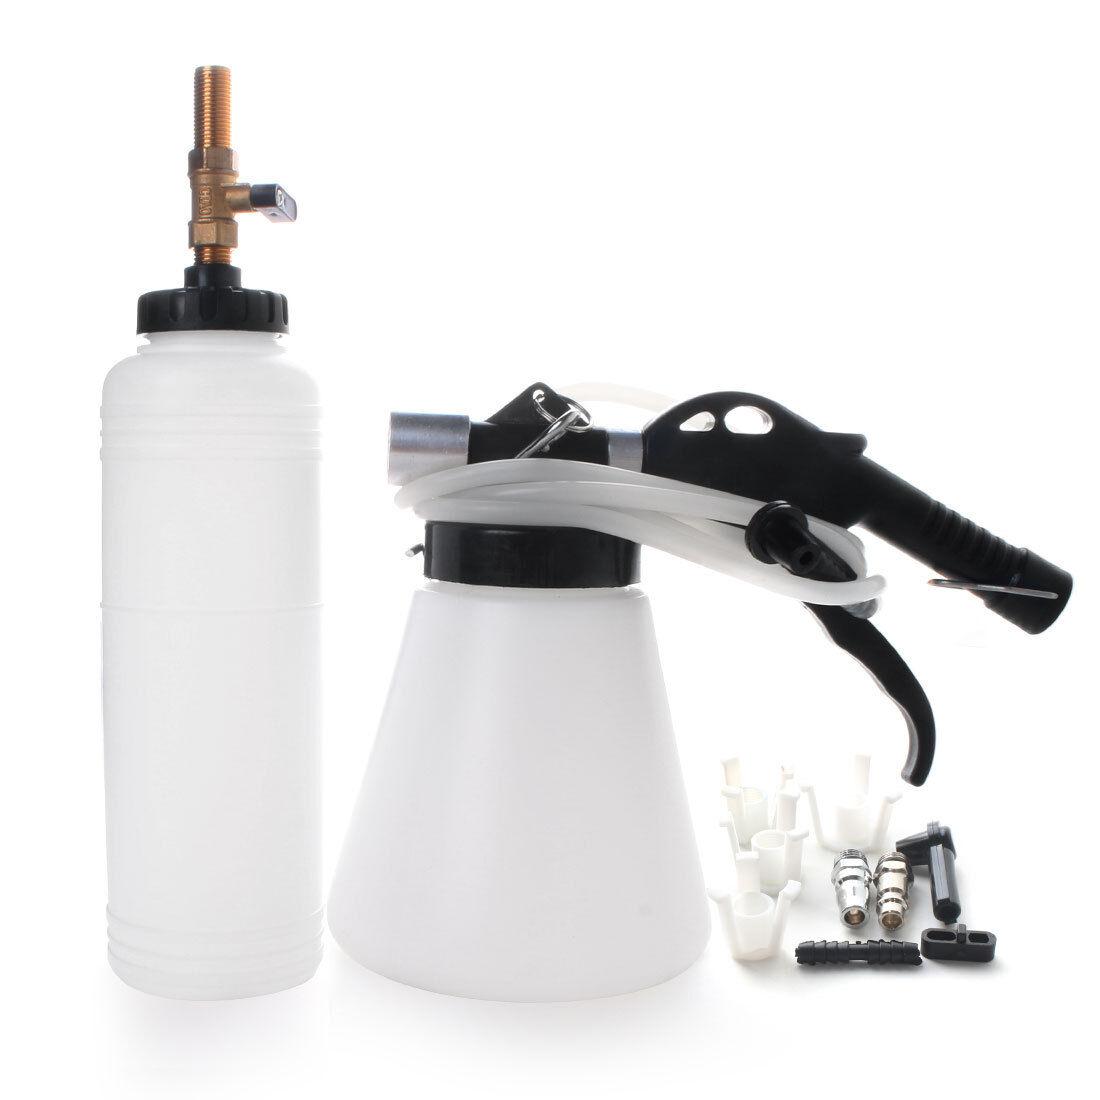 Pneumatic Brake Fluid Bleeder w// 4 Master Cylinder Adapters 90-120 PSI